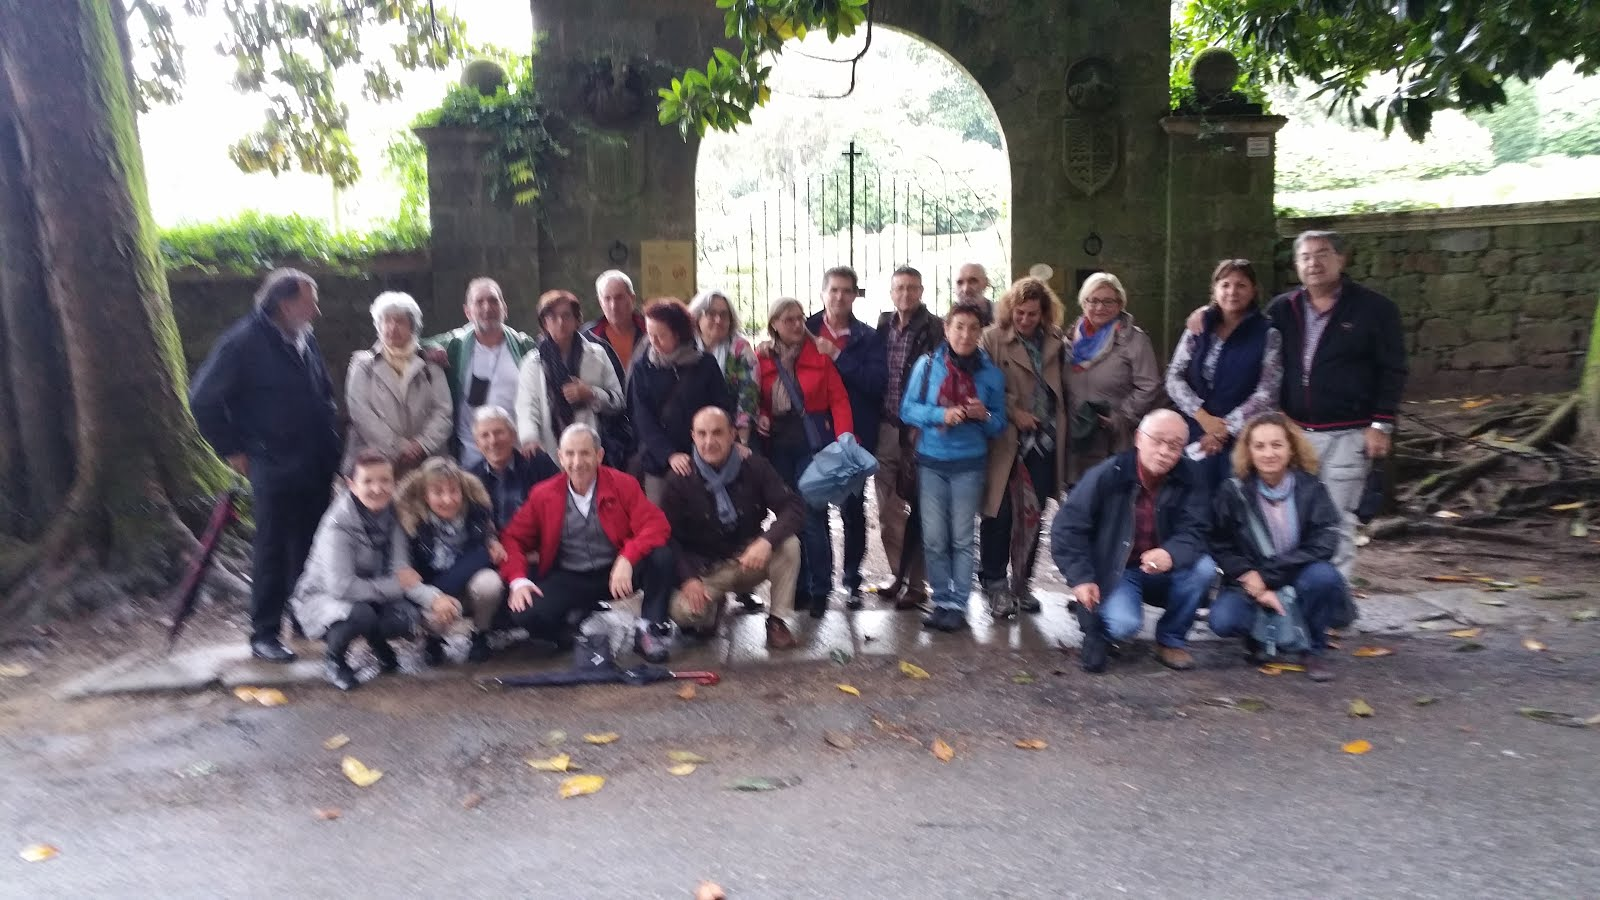 Pontevedra Otoño 2015